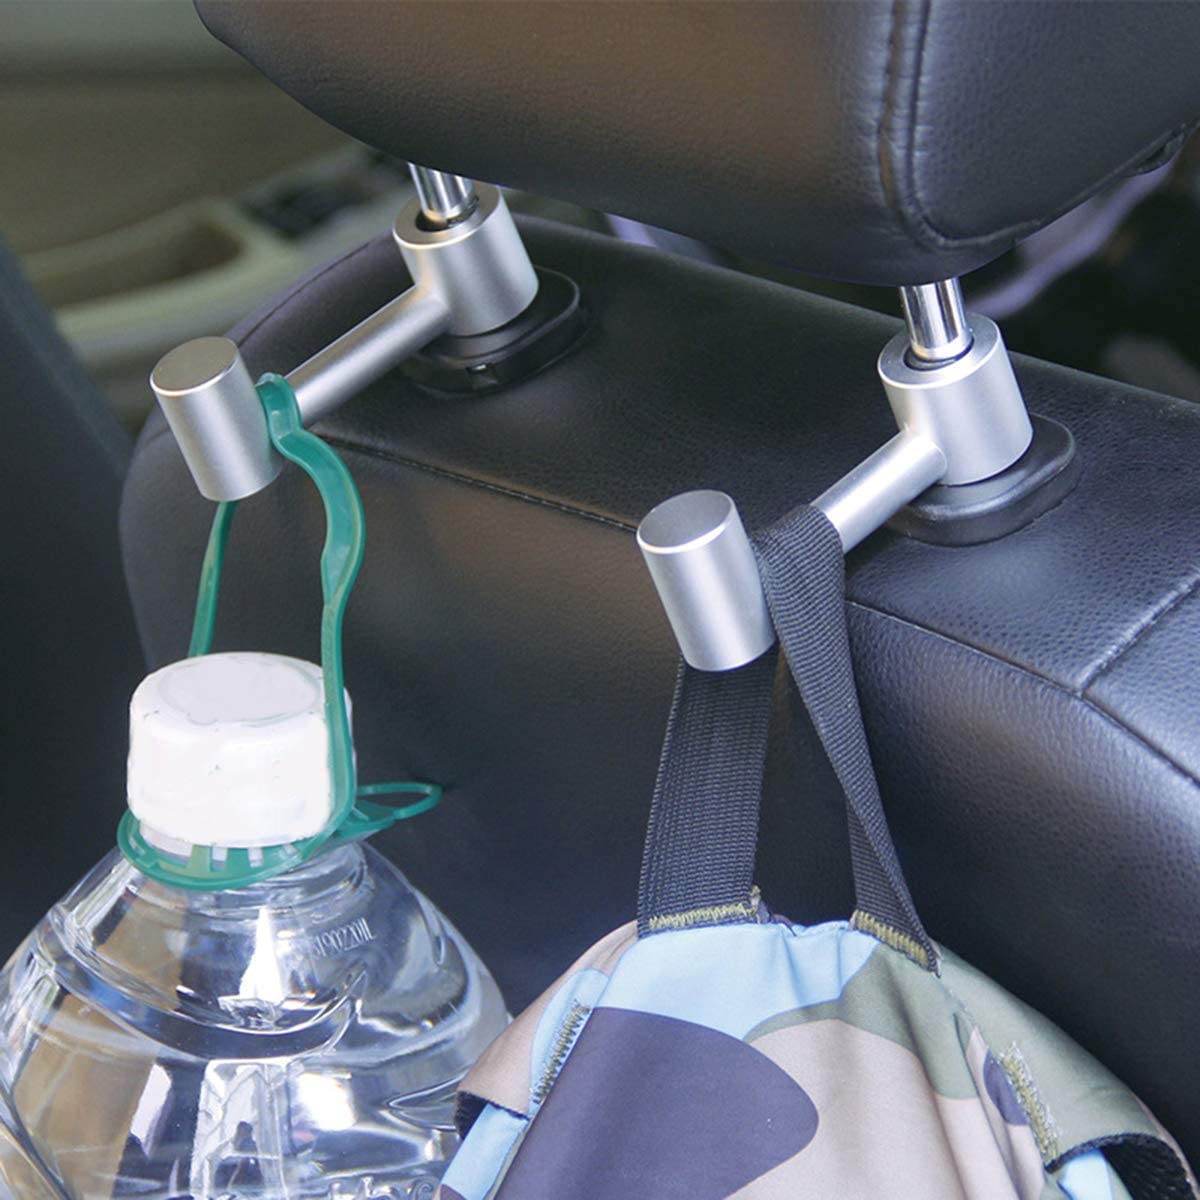 DEALPEAK Aluminum Alloy Car Headrest Bar Hook Coat Grocery Bag Hanger Storage Organizer Holder Hook 2 Colors Optional